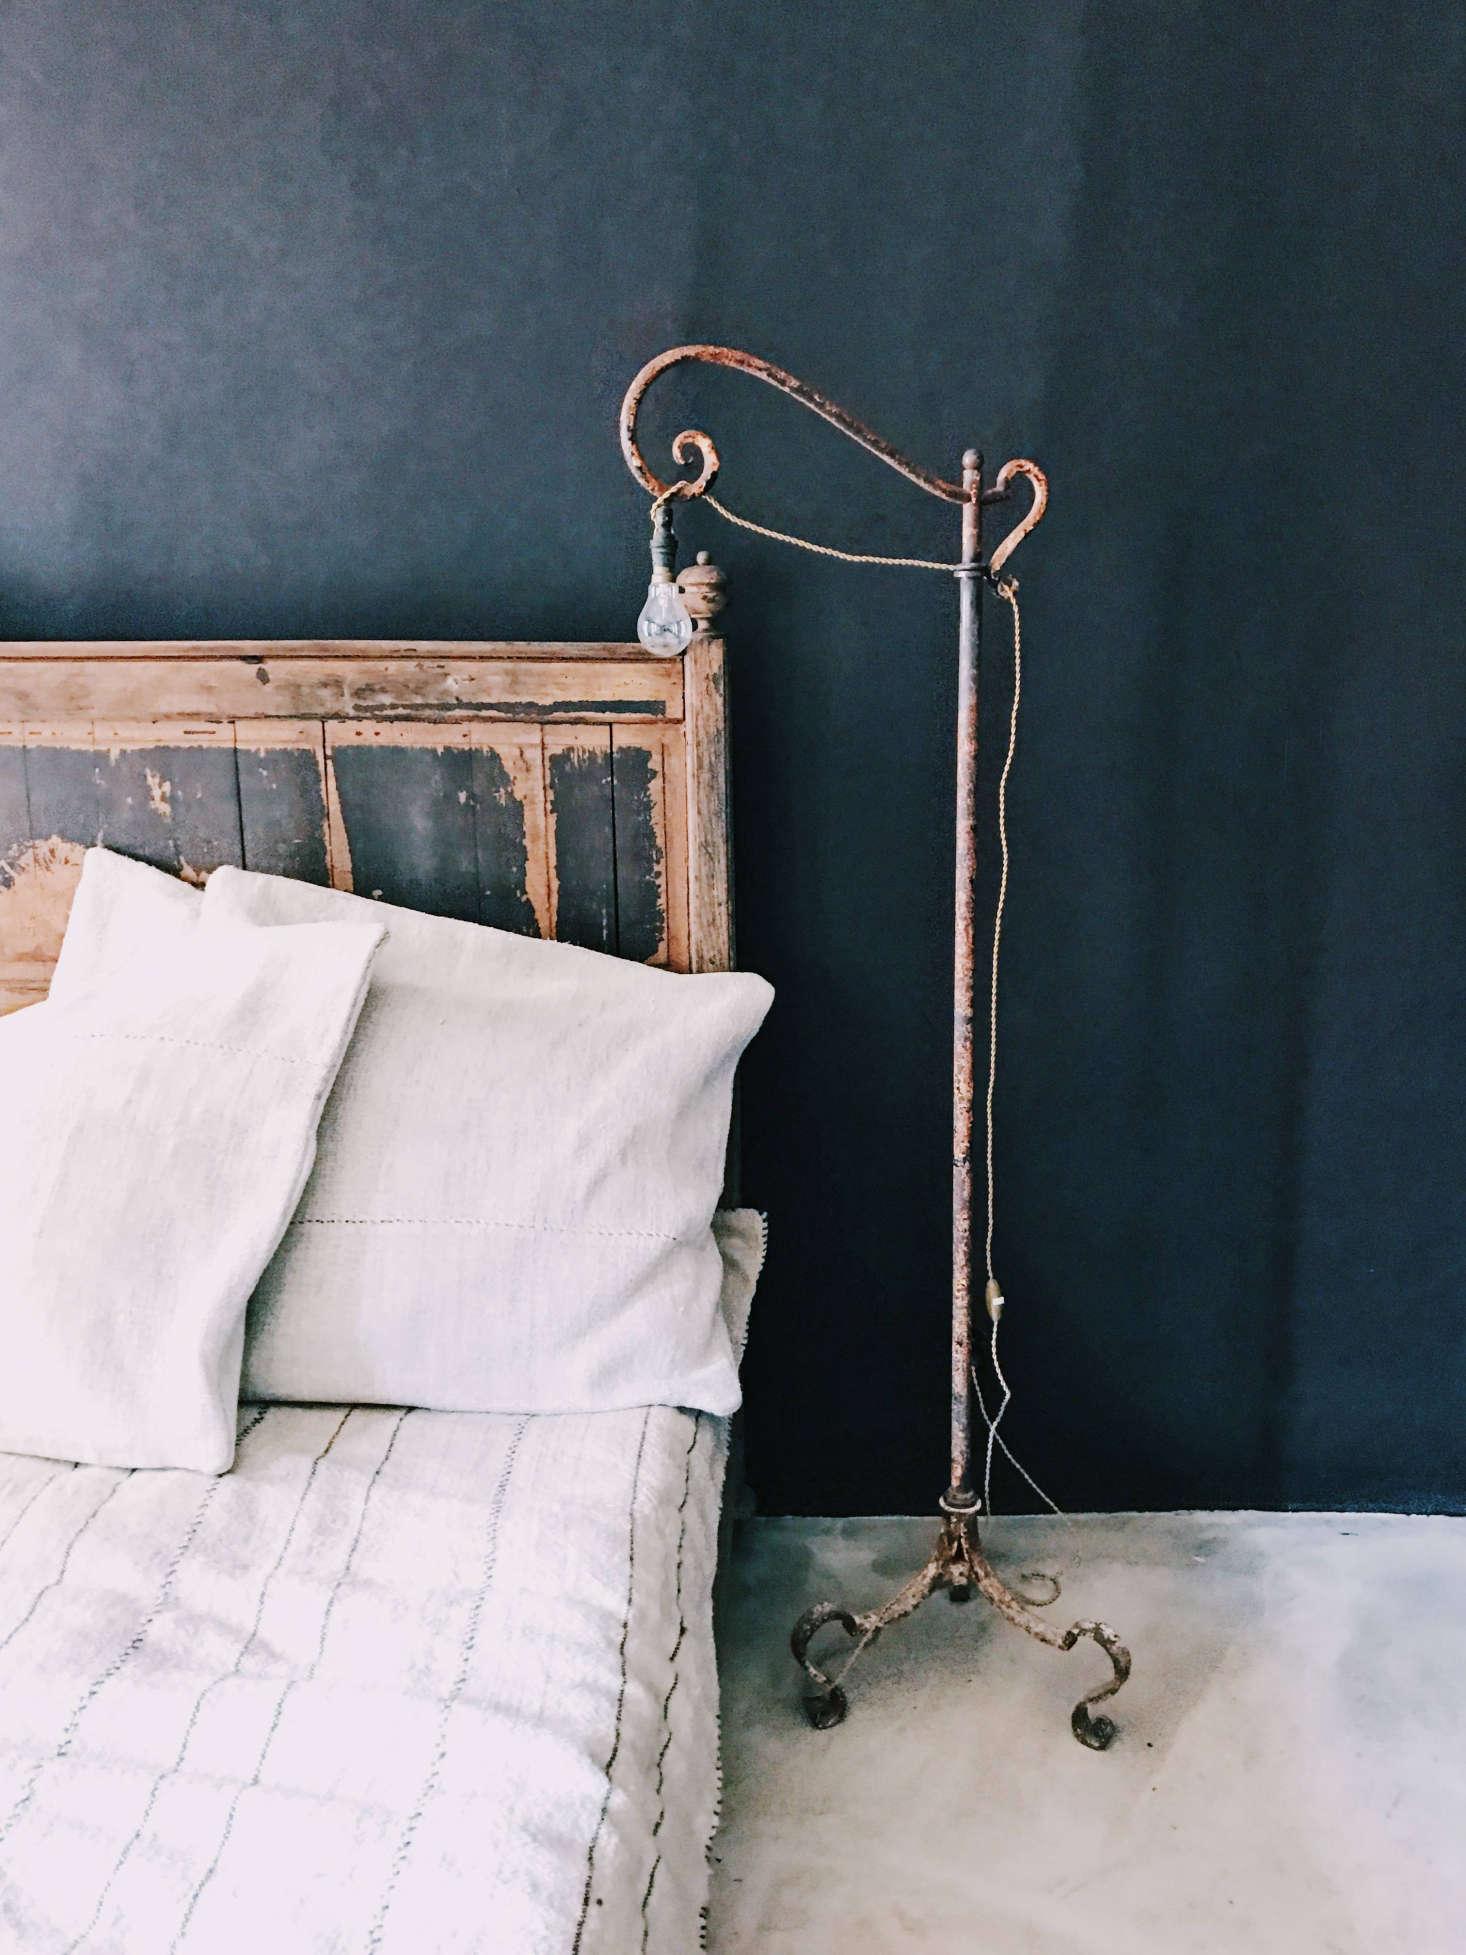 A vintage lamp provides bedside illumination.